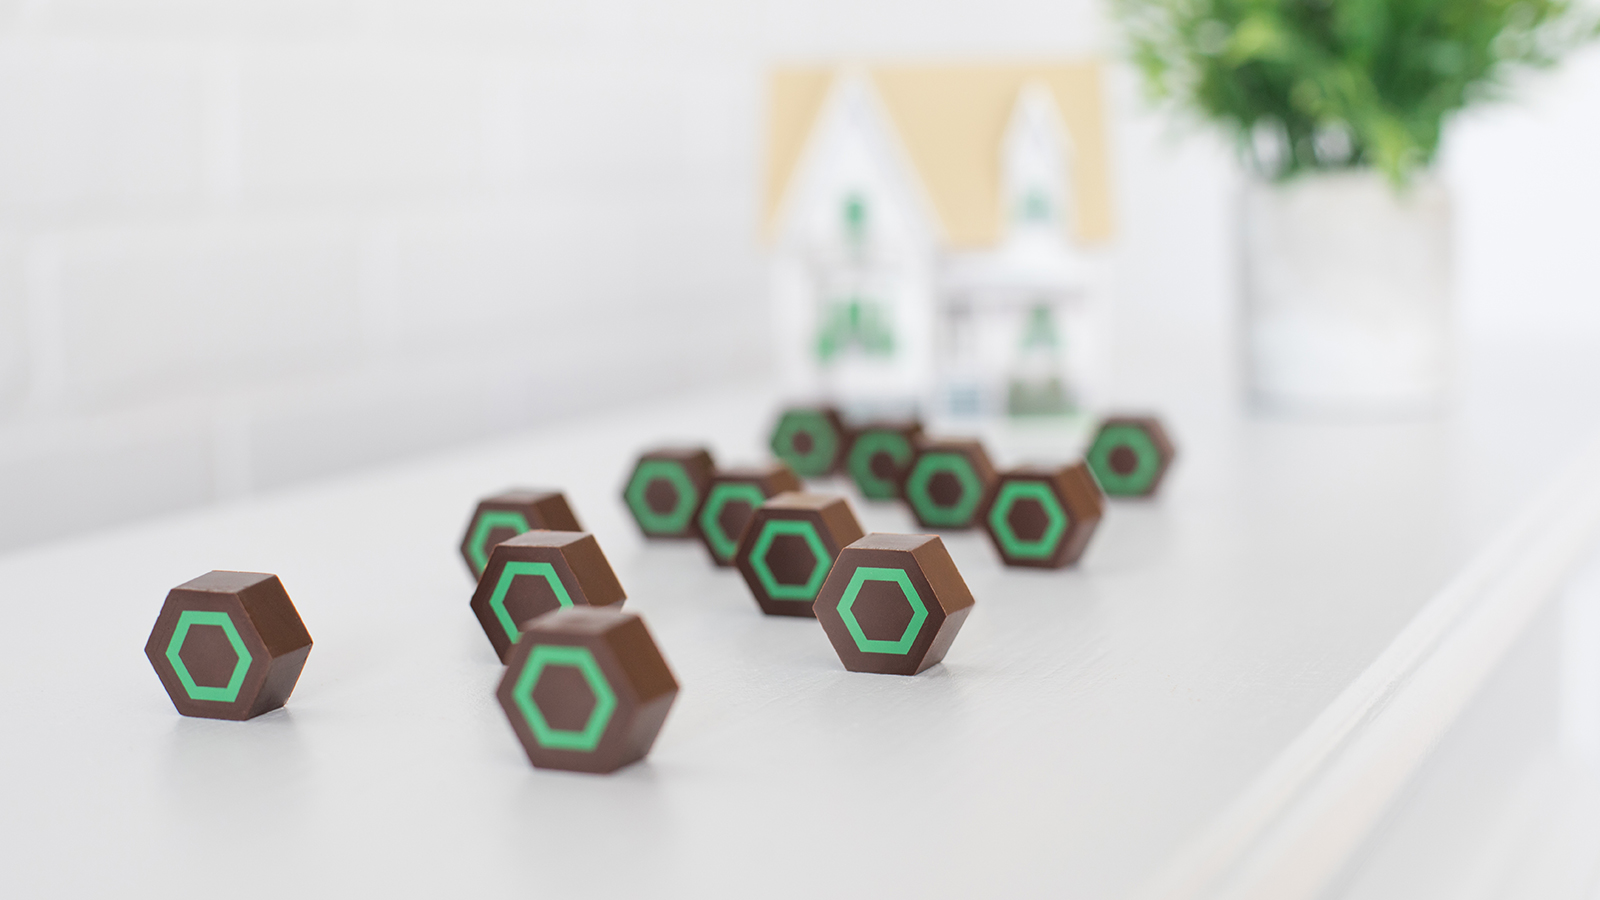 ChocoChocolat_CadeauxCorpo_Banniere1600x900-Desjardins